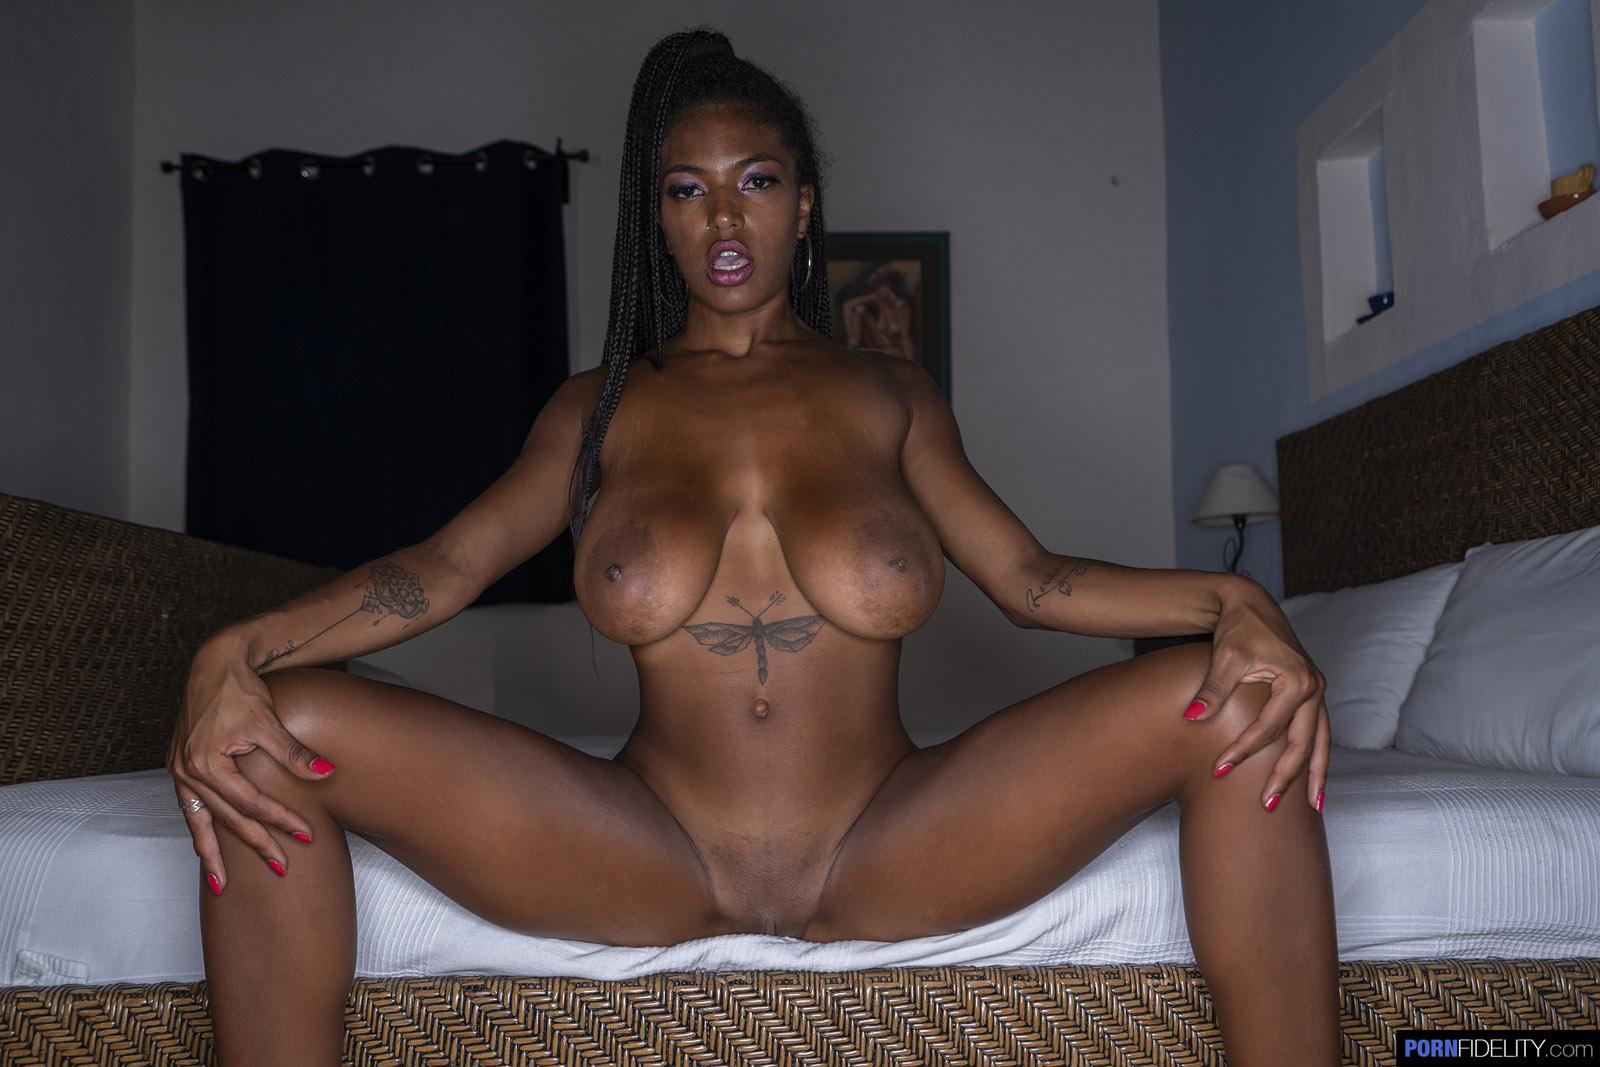 https://cdn.curvyerotic.com/wp-content/uploads/2020/09/tina-fire-shes-on-fire-pornfidelity-12.jpg